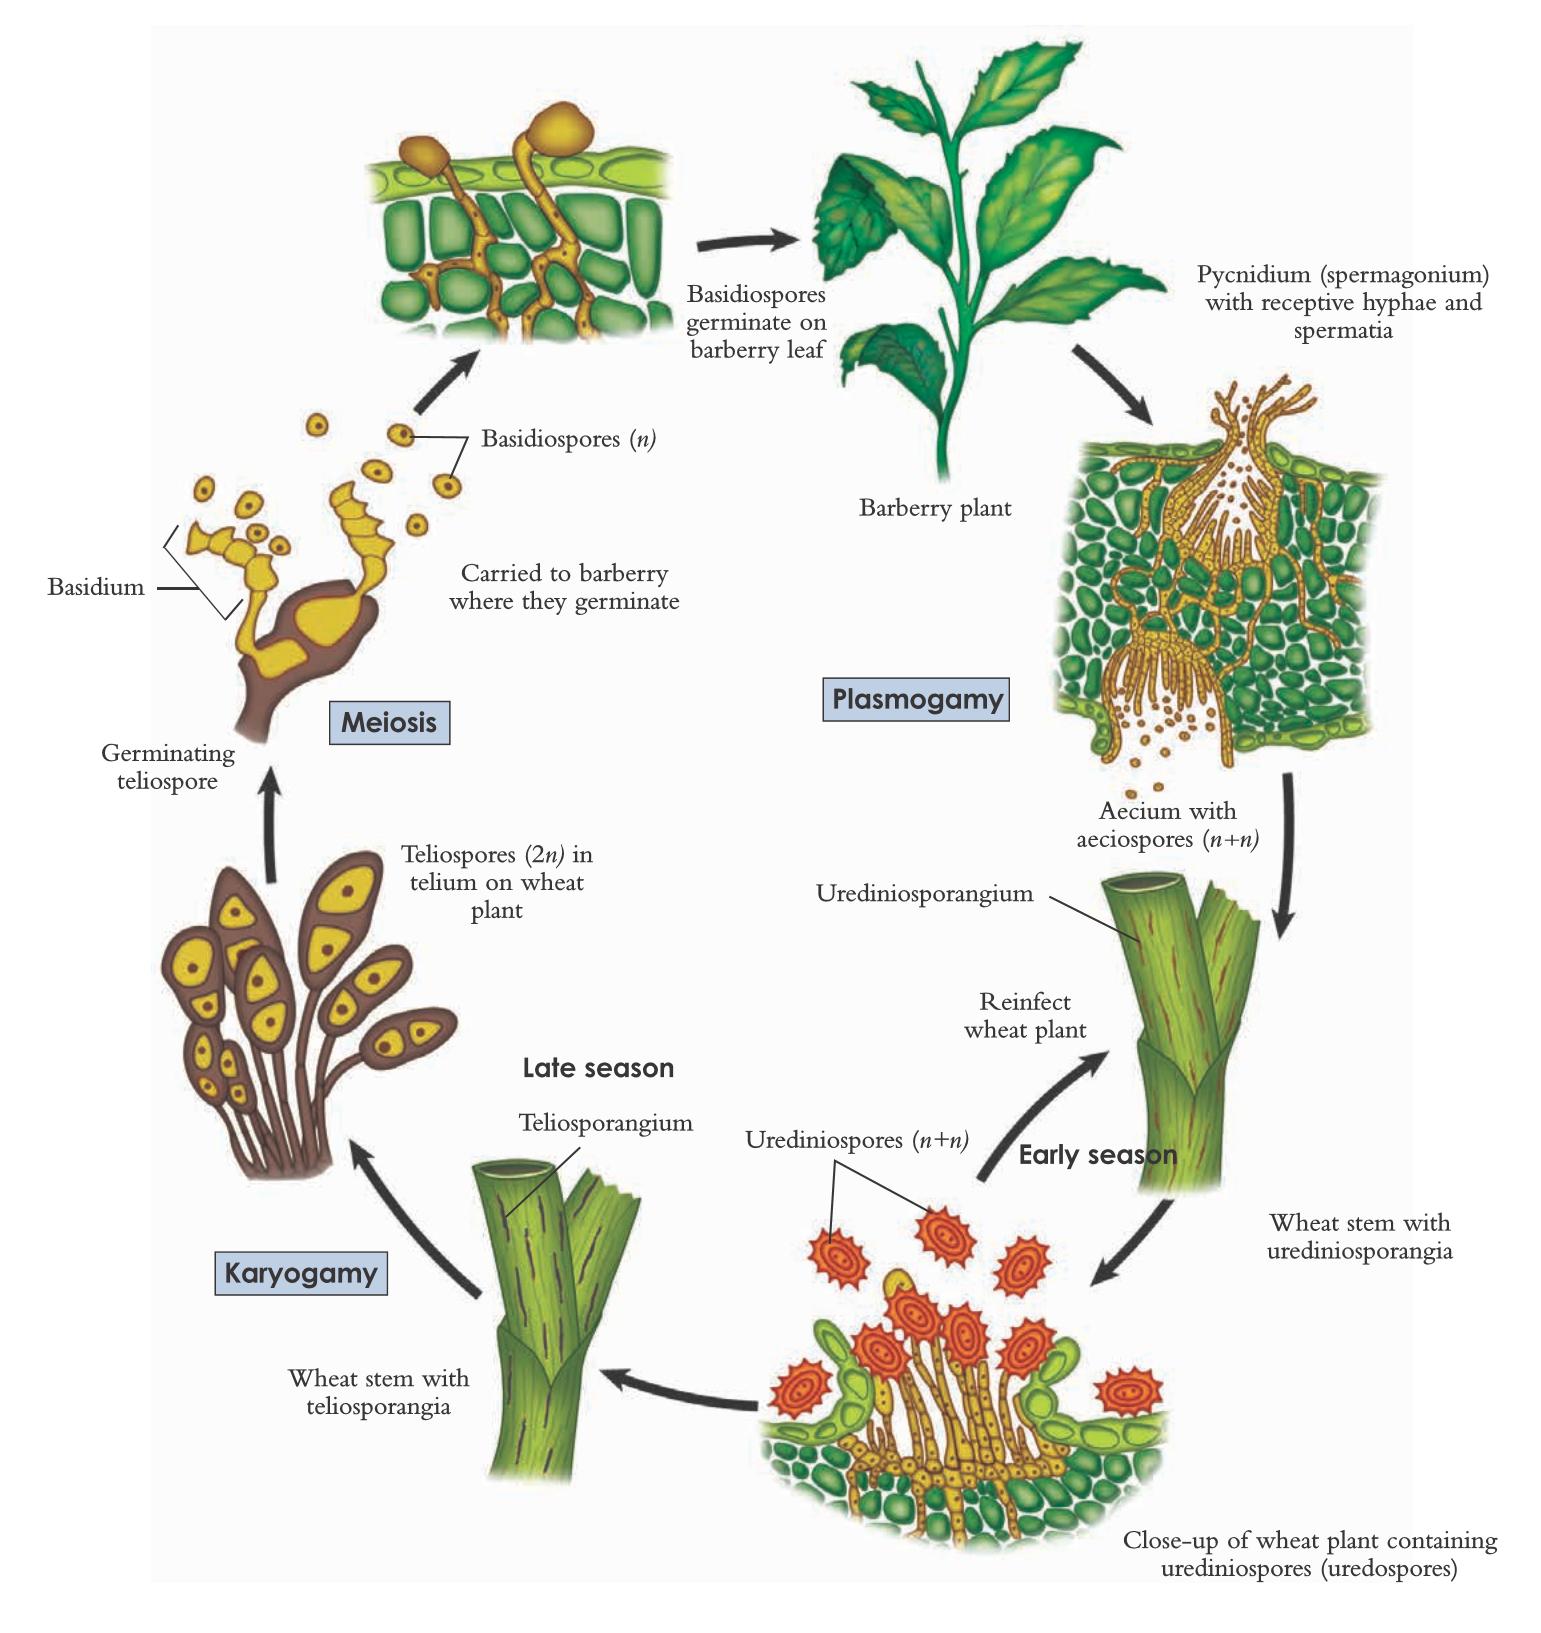 wheat rust life cycle | Basidiomycota-Urediniomycetes-Puccinia ...